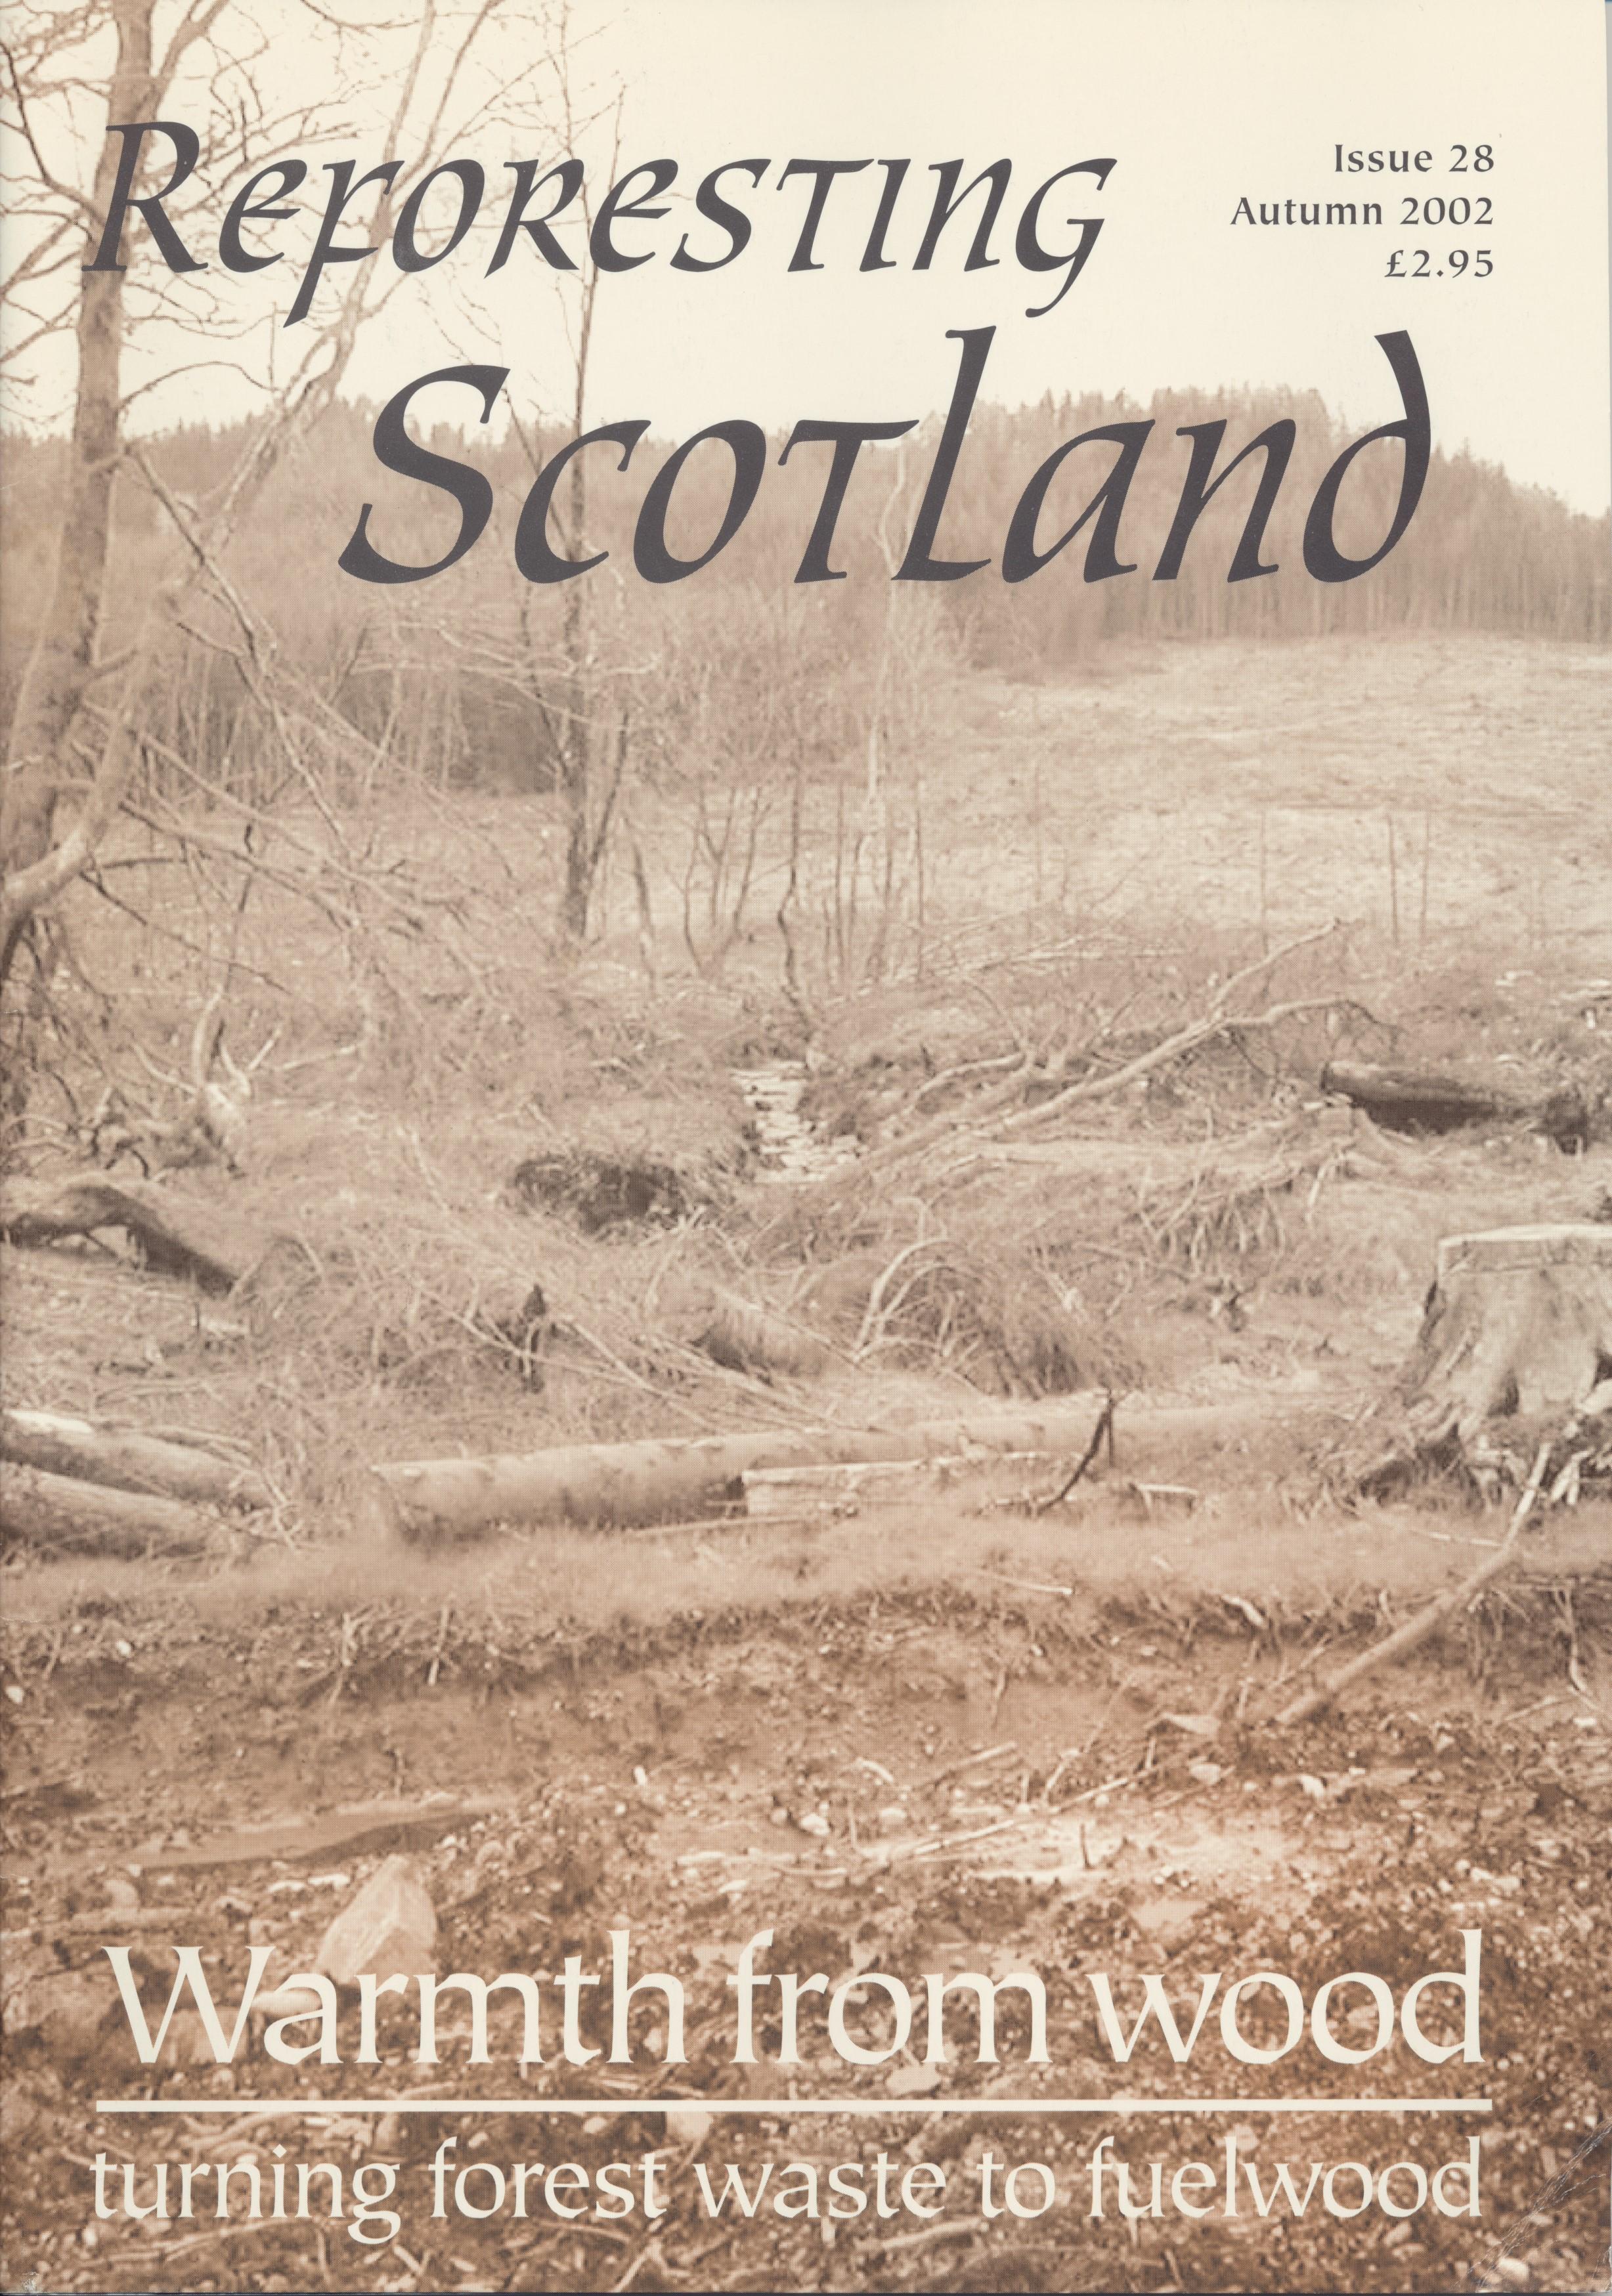 Reforesting Scotland 28, Autumn 2002